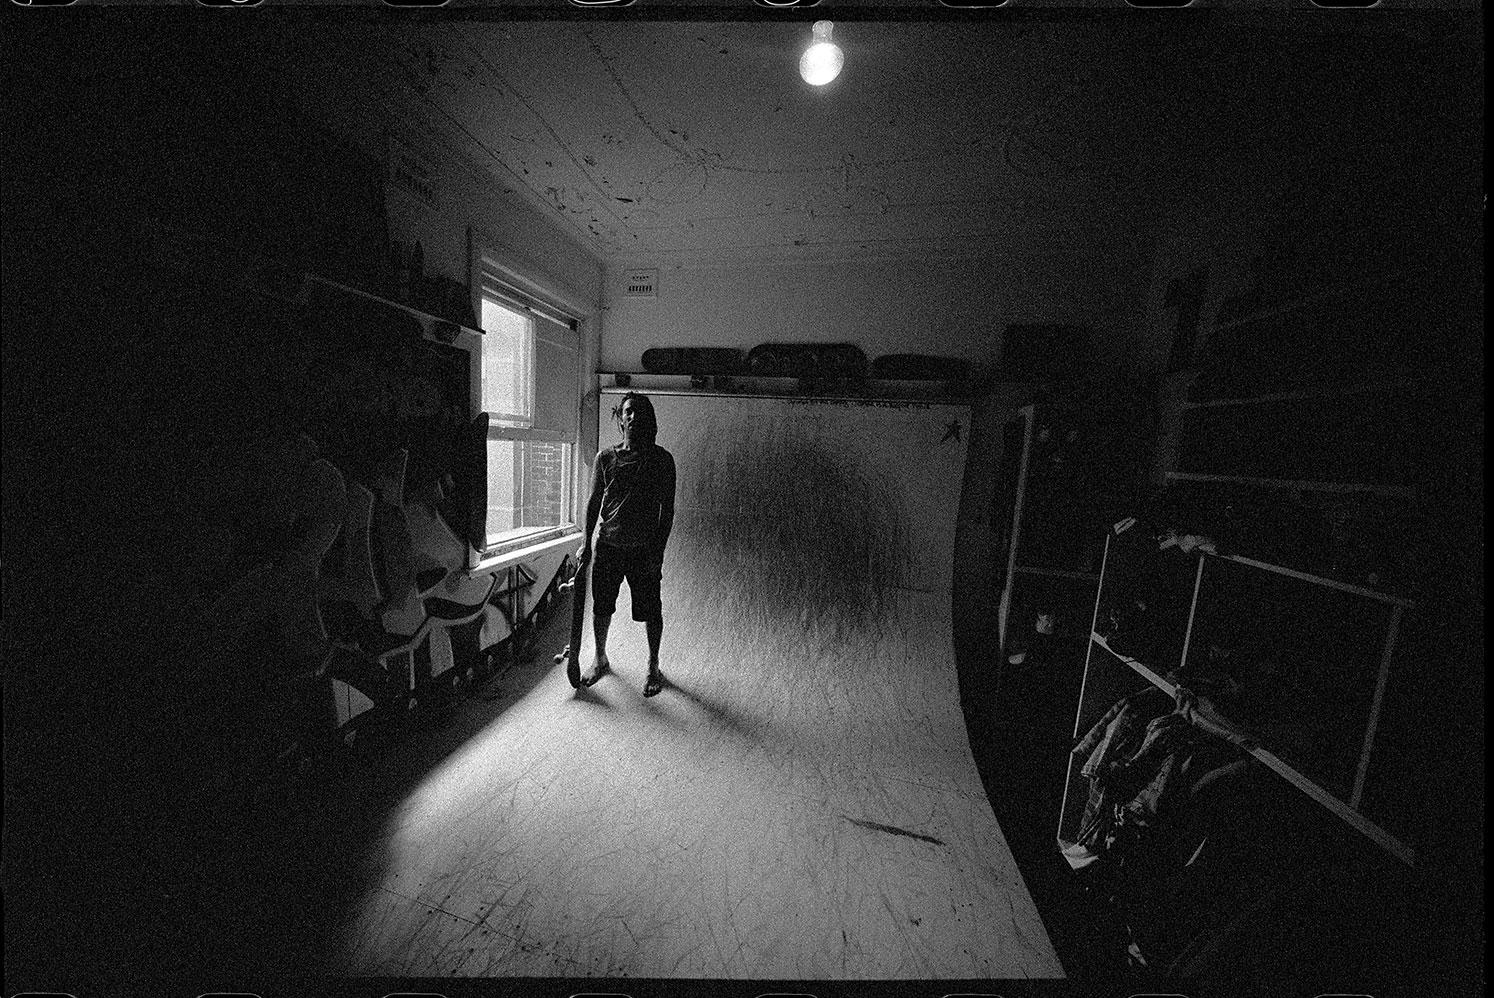 Josh, Portrait, Bedroom Ramp, Bondi, NSW, Silver Gelatin Print, 50.8cm x 60.1cm, 1/5